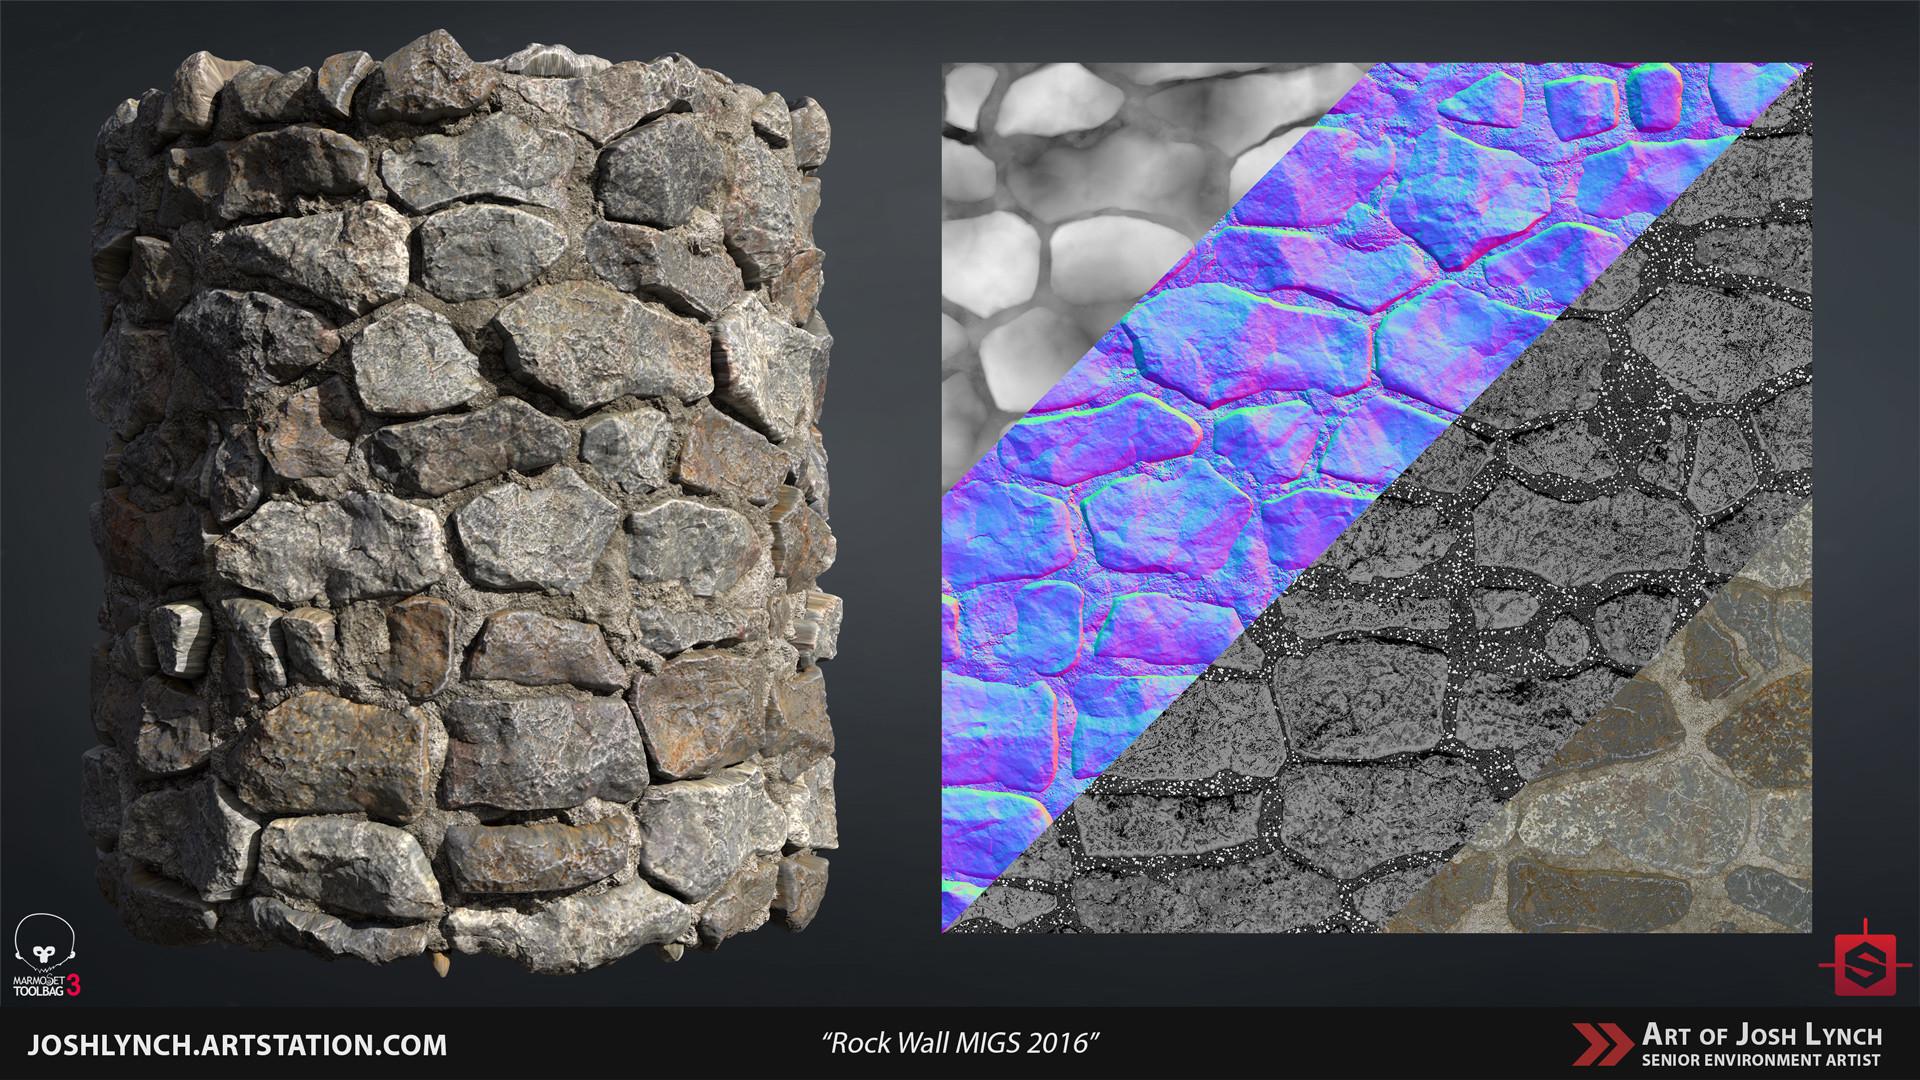 Joshua lynch migs stone wall 02 cylinder layout comp